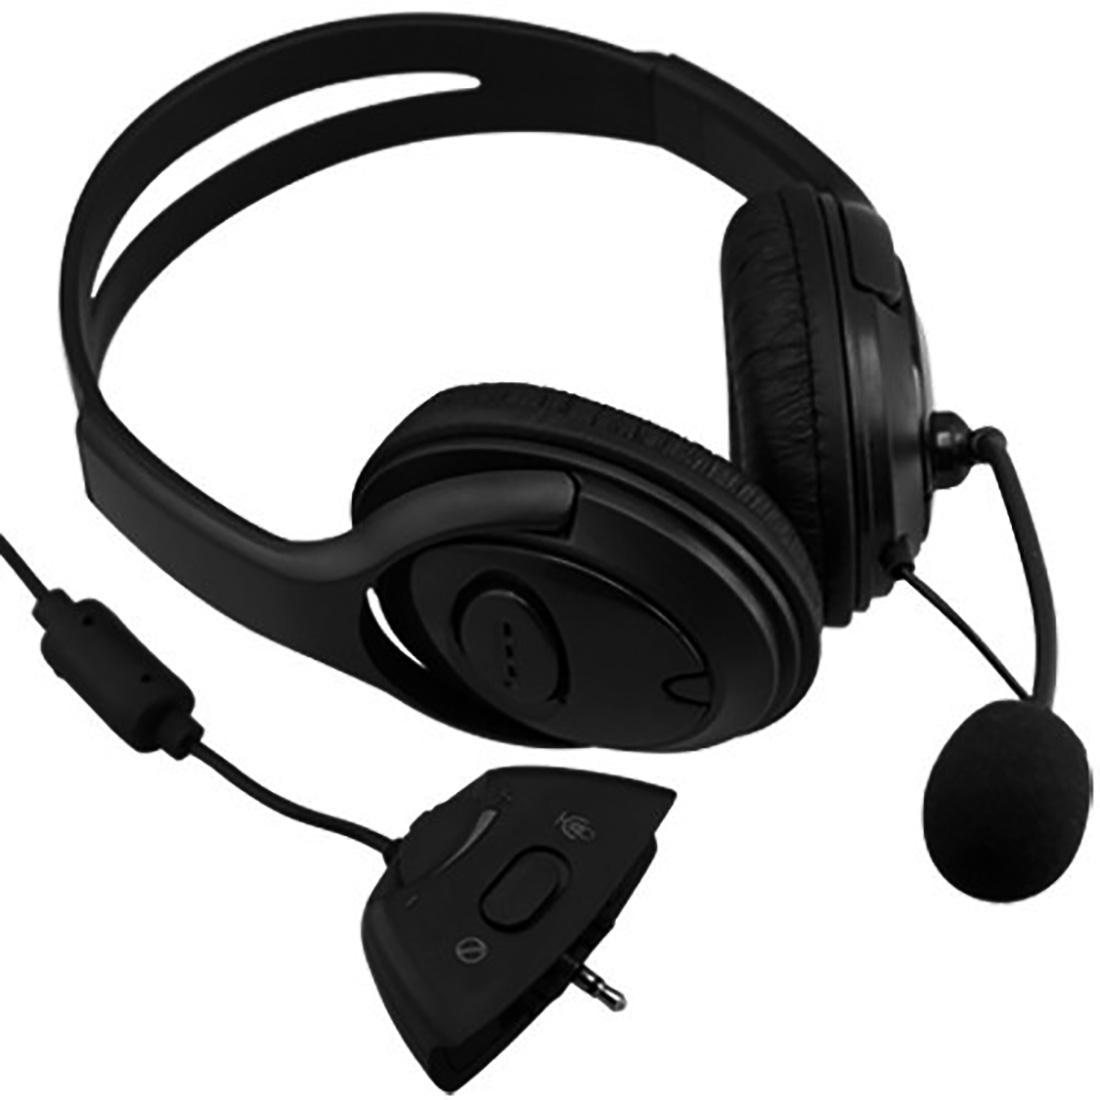 Drawn headphones computer microphone Protable xbox360 China xbox360 Chat